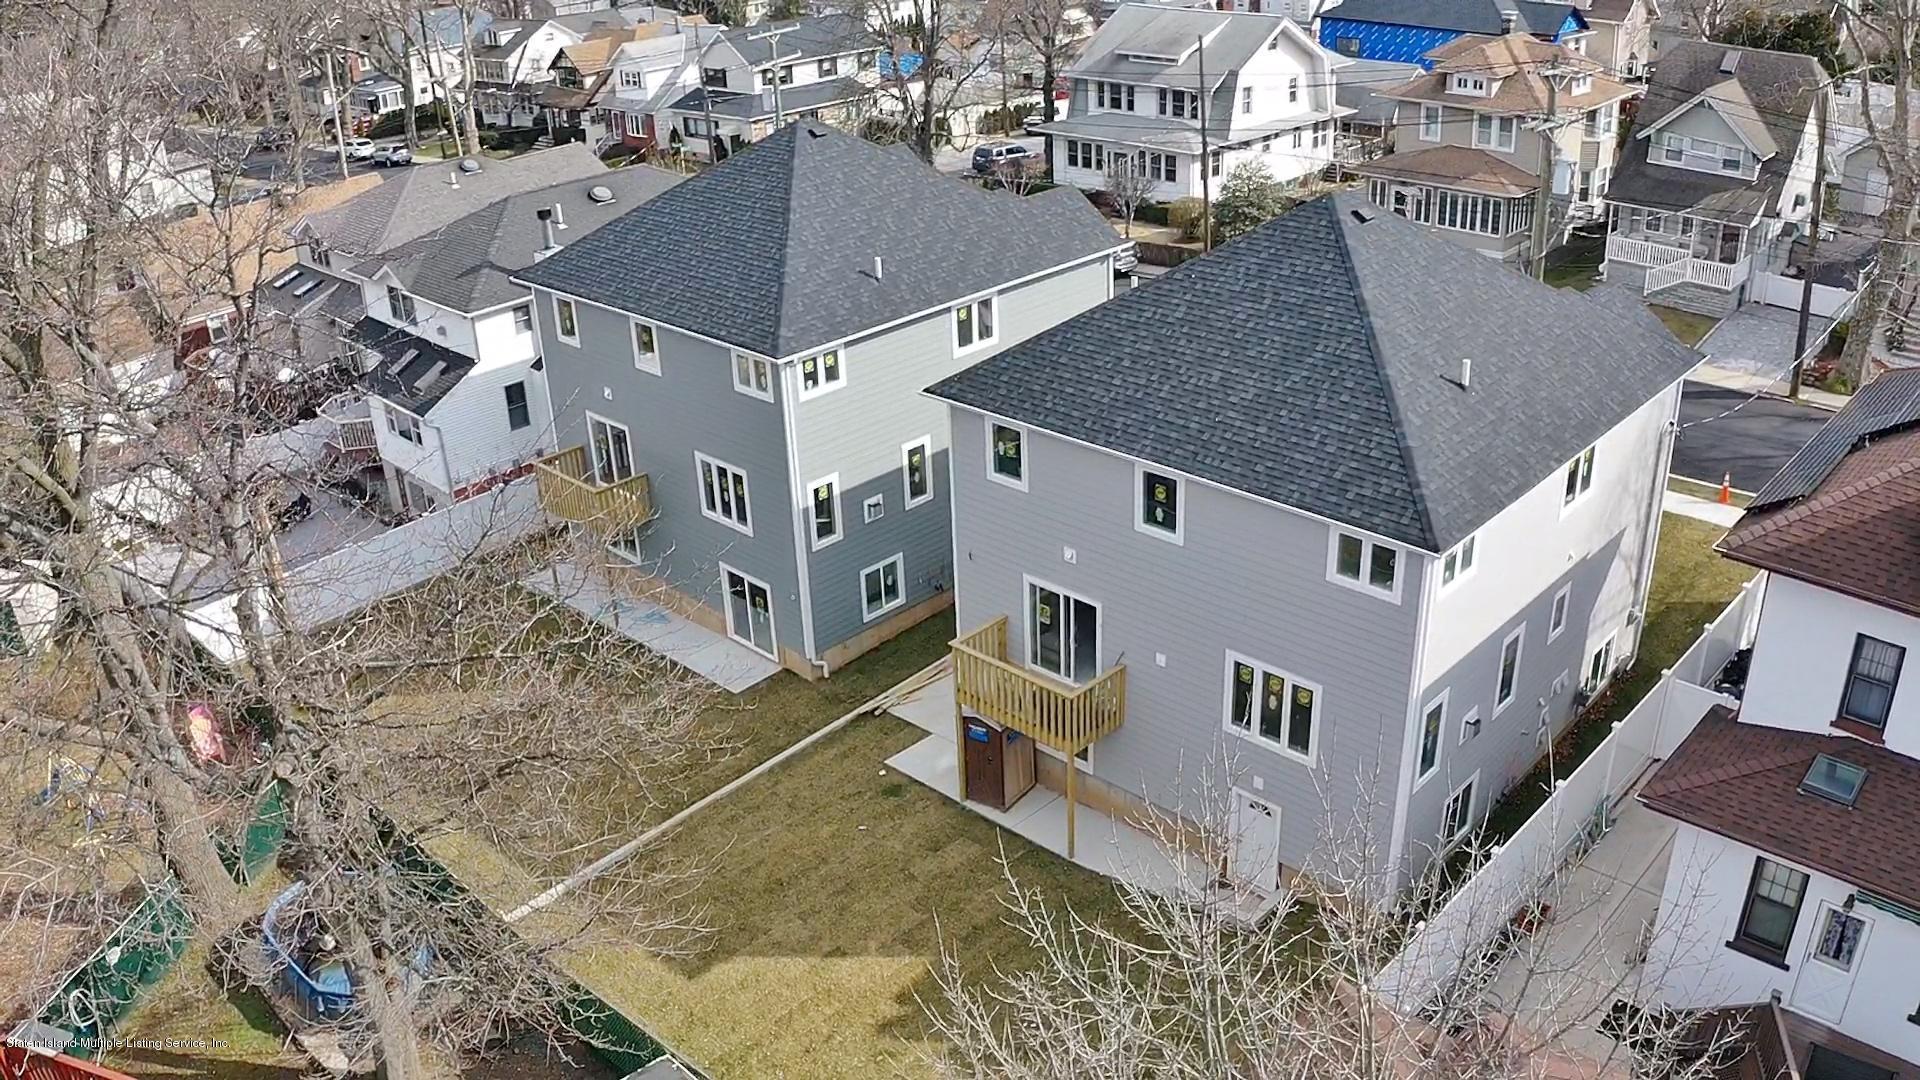 Single Family - Detached 170 Fairview Avenue  Staten Island, NY 10314, MLS-1126684-19